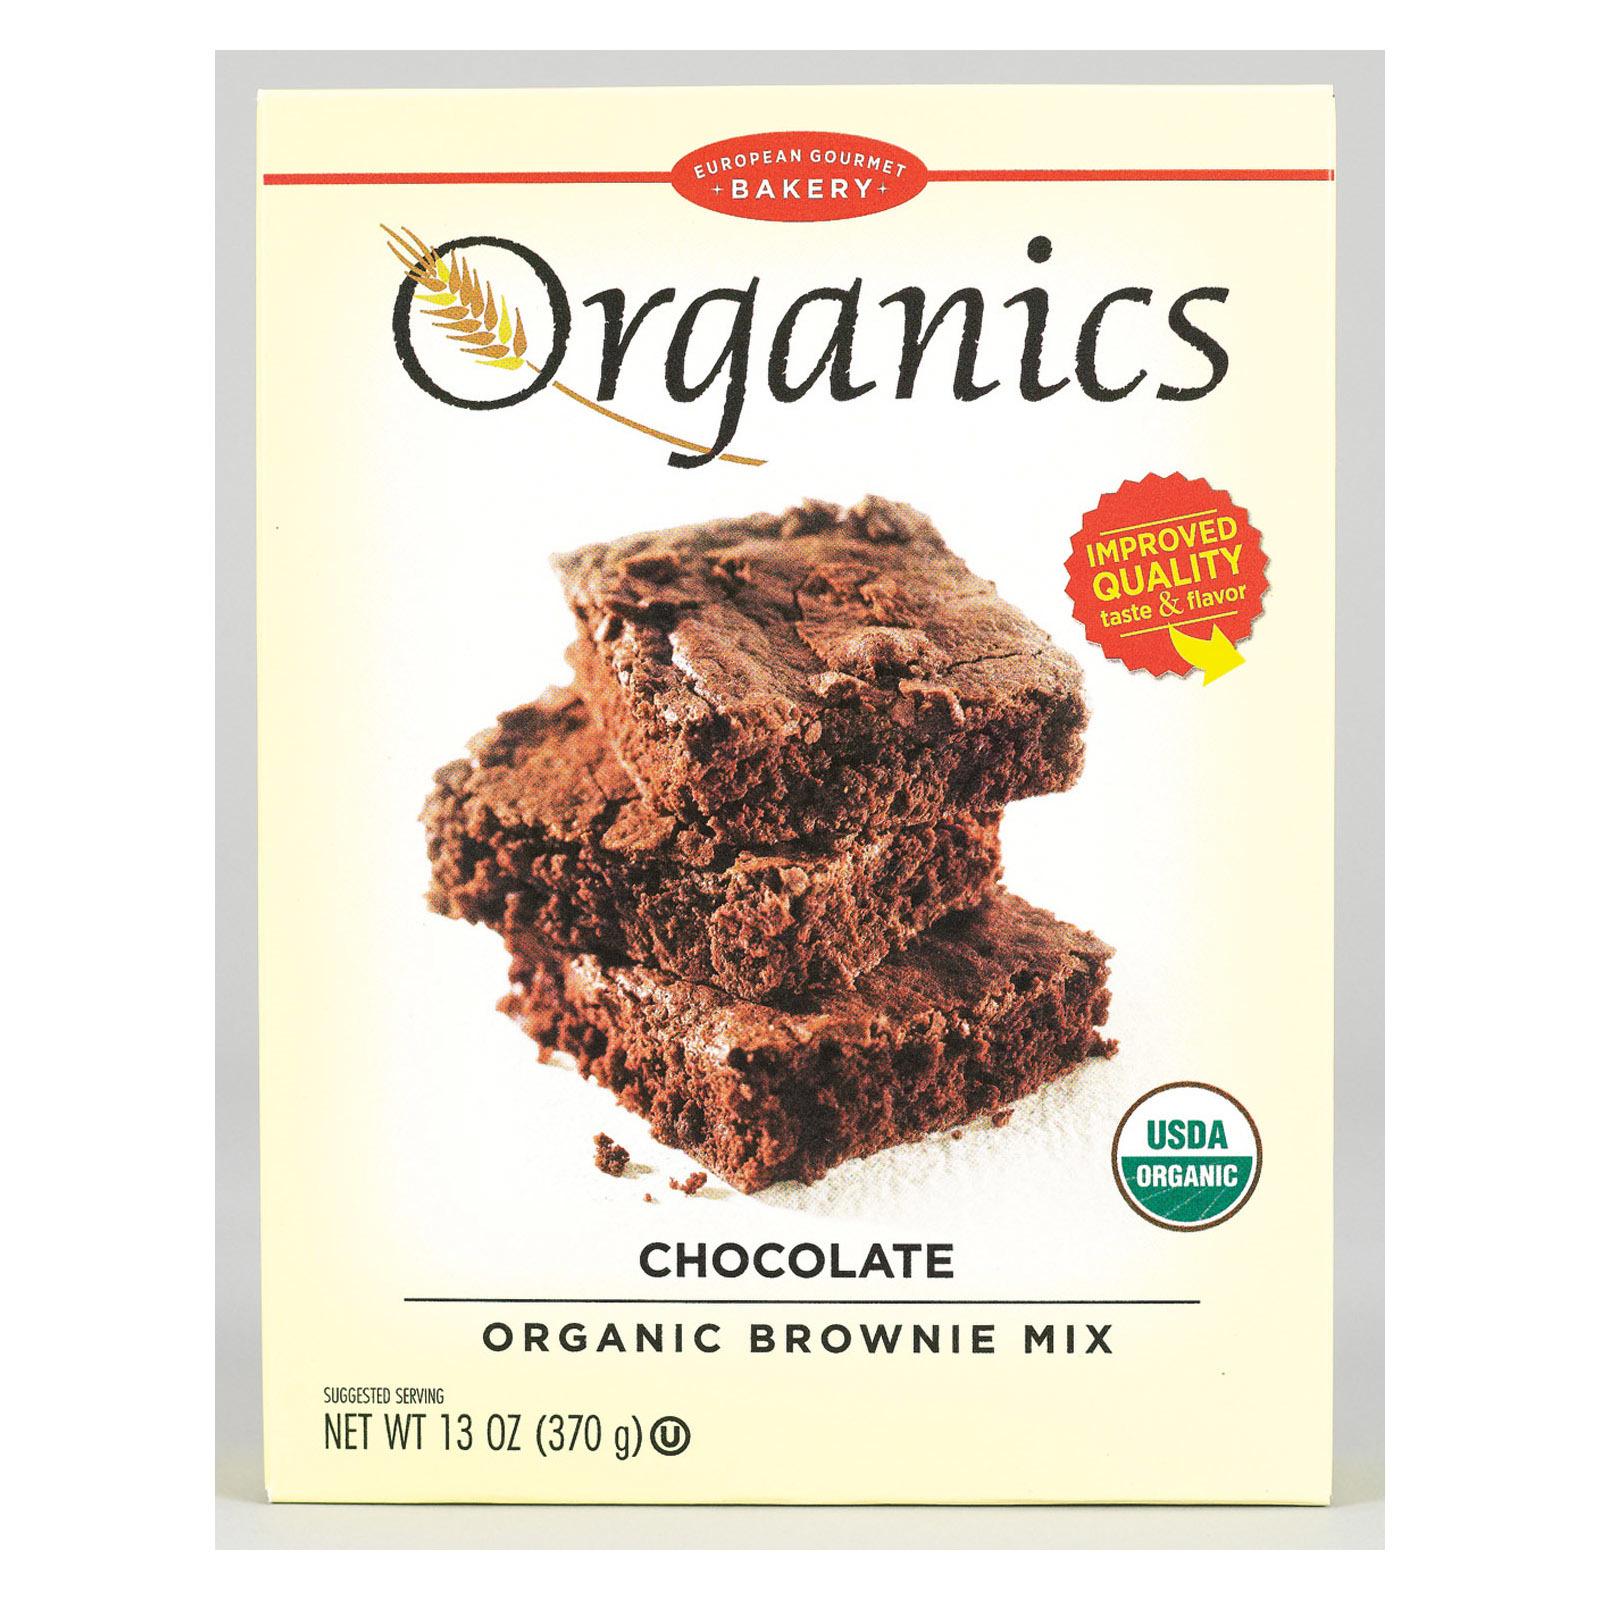 European Gourmet Bakery Organic Chocolate Brownie Mix - Chocolate Brownie Mix - 13 oz.